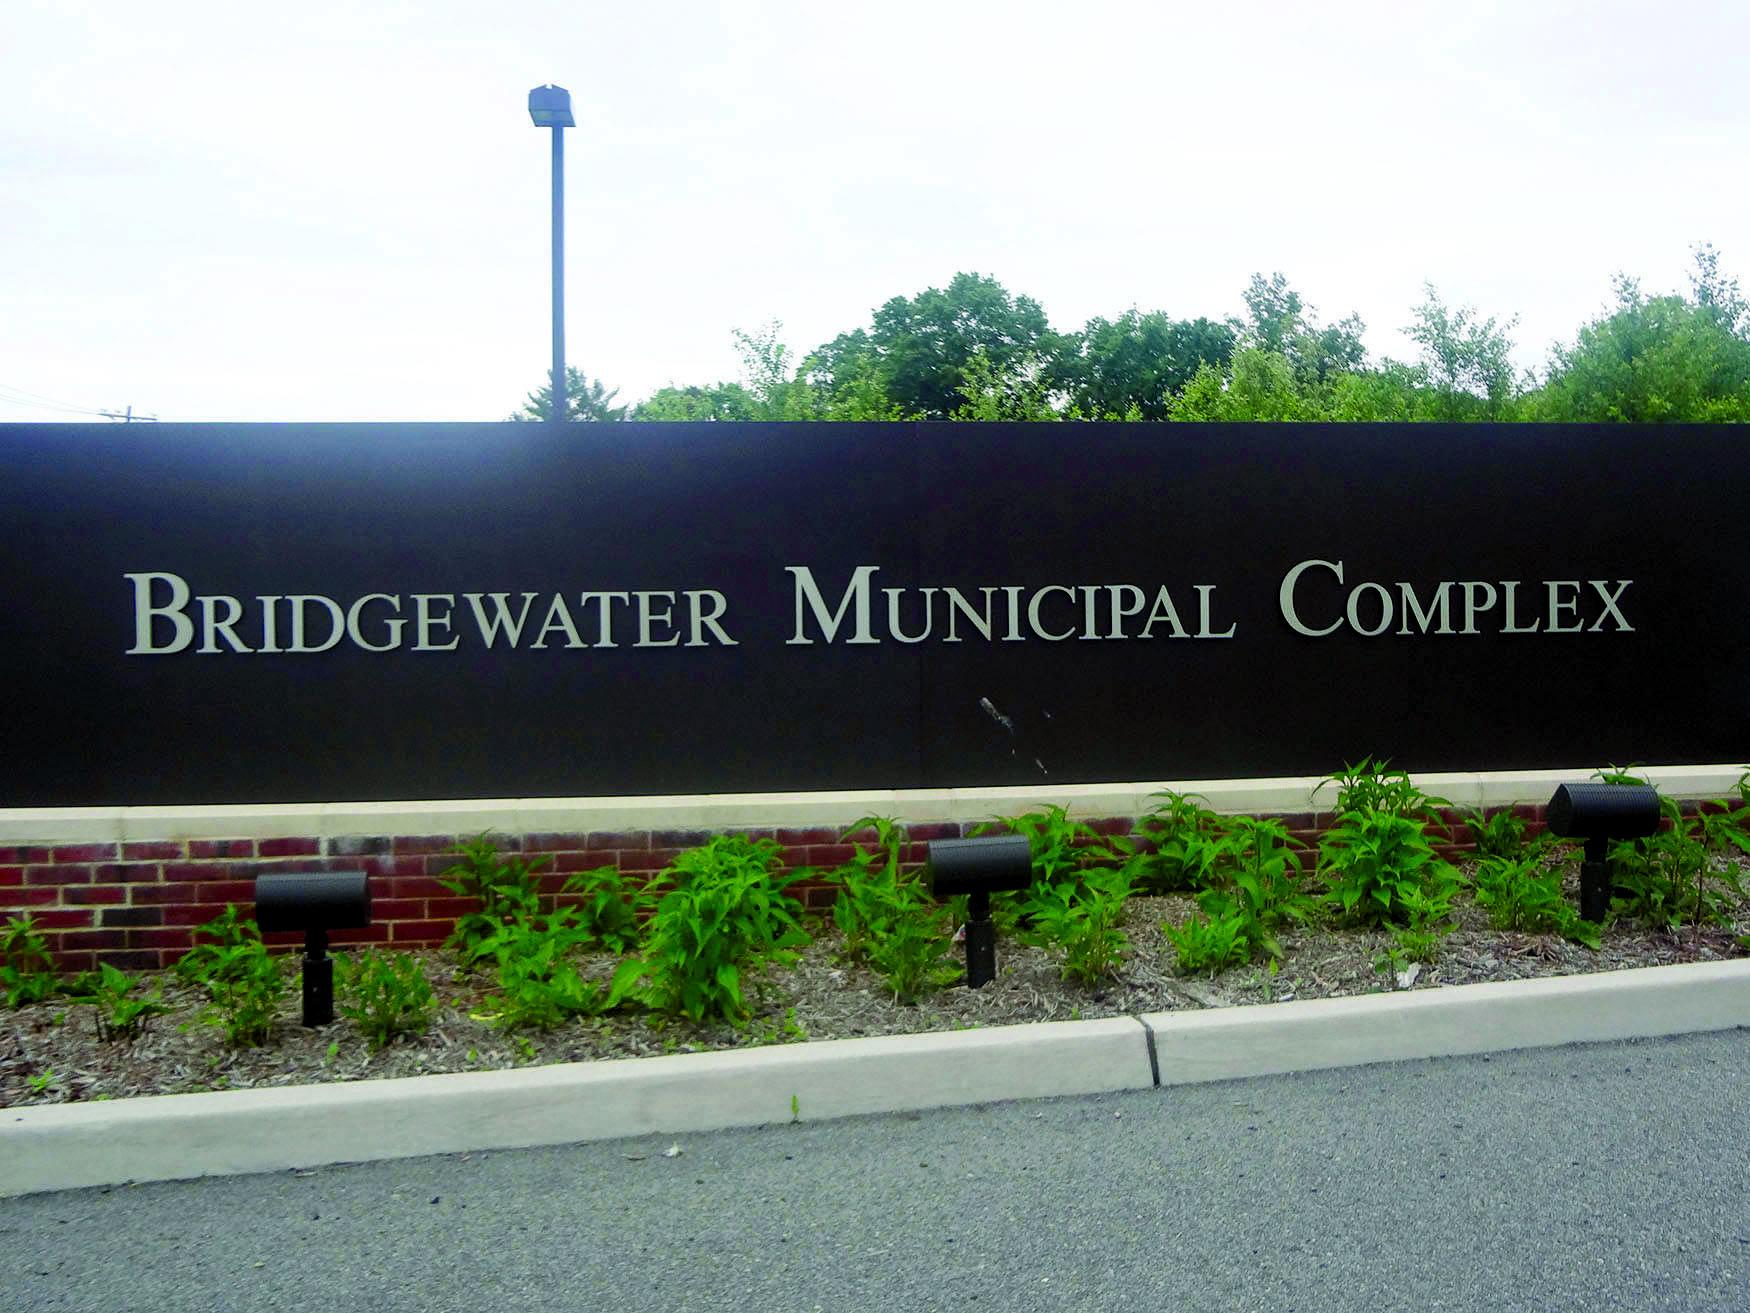 441cb215378fad156adf_Bridgewater_municipal.jpg